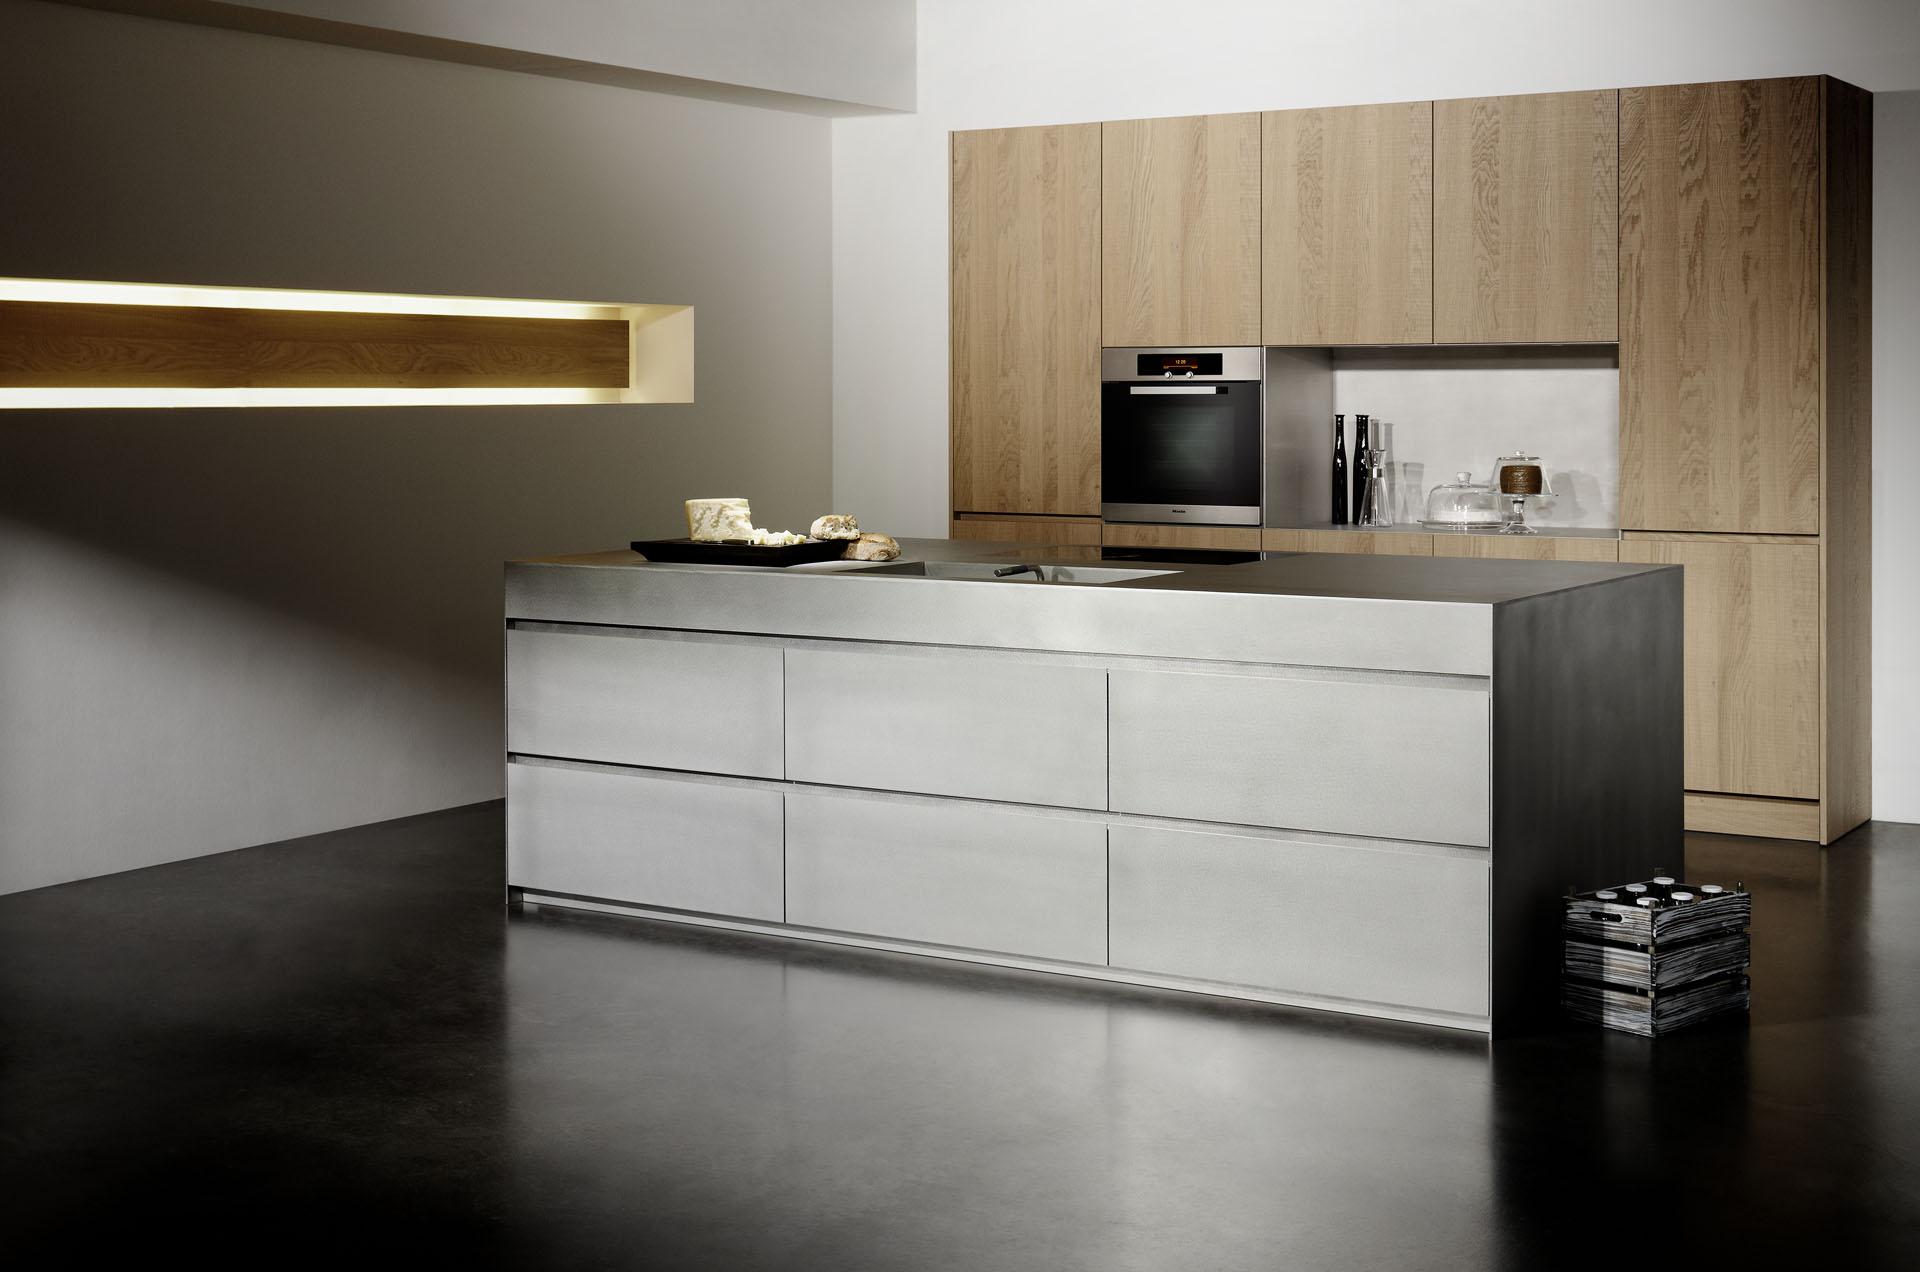 Eigentijdse keuken grijs: design keukens aswa keukens. witte keuken